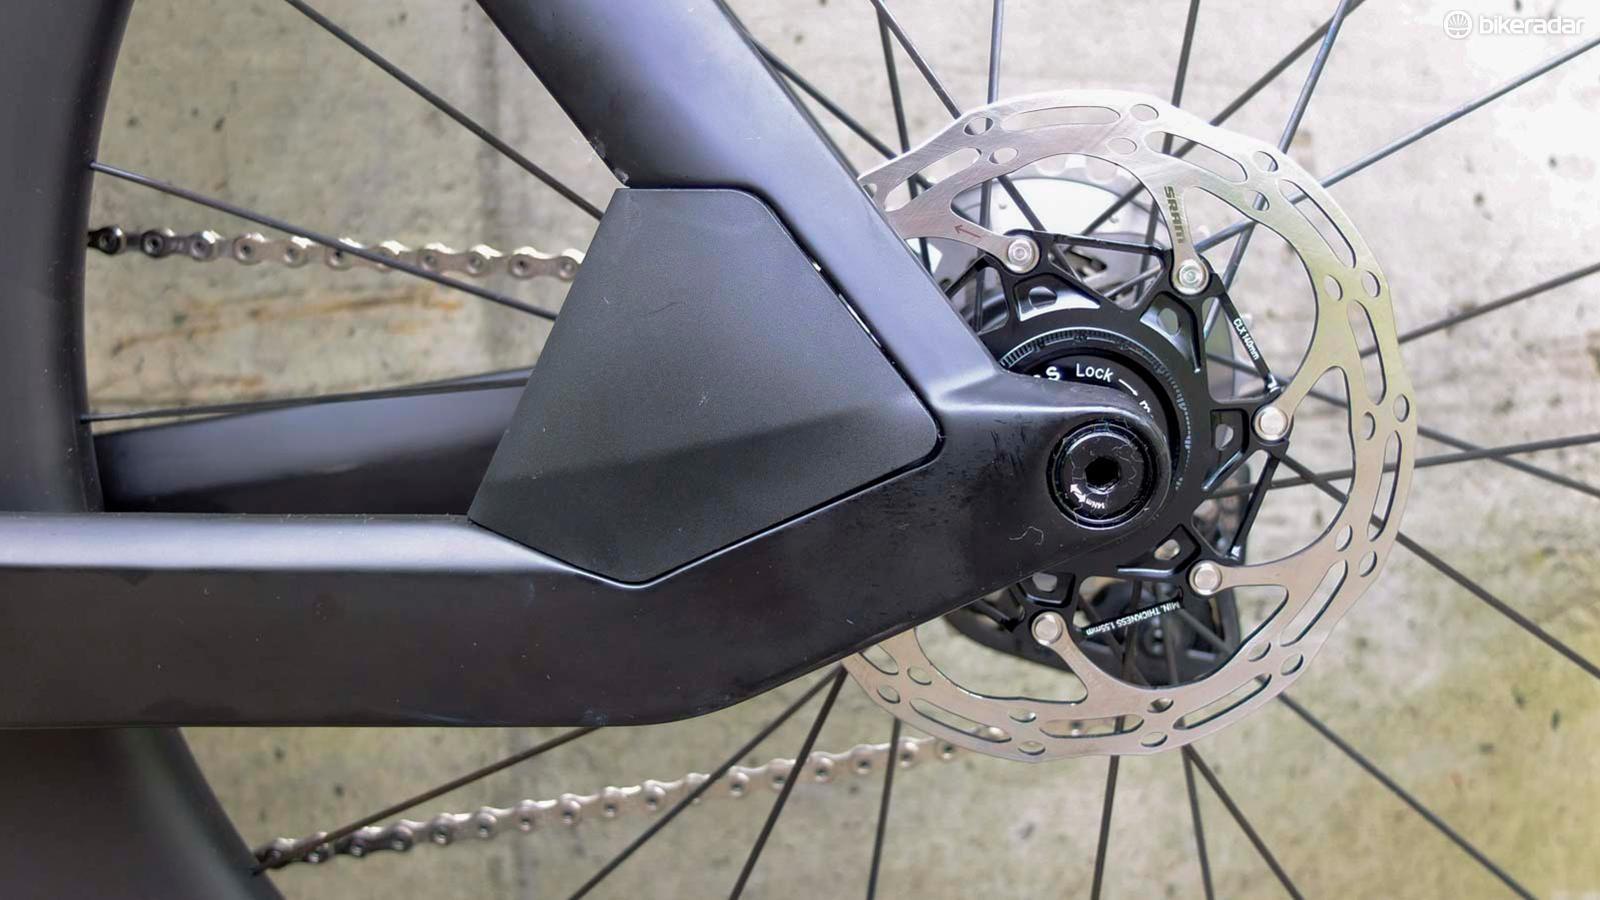 Unlike the Timemachine Road 01, the Timemachine 01 Disc also gains a rear disc brake caliper shield